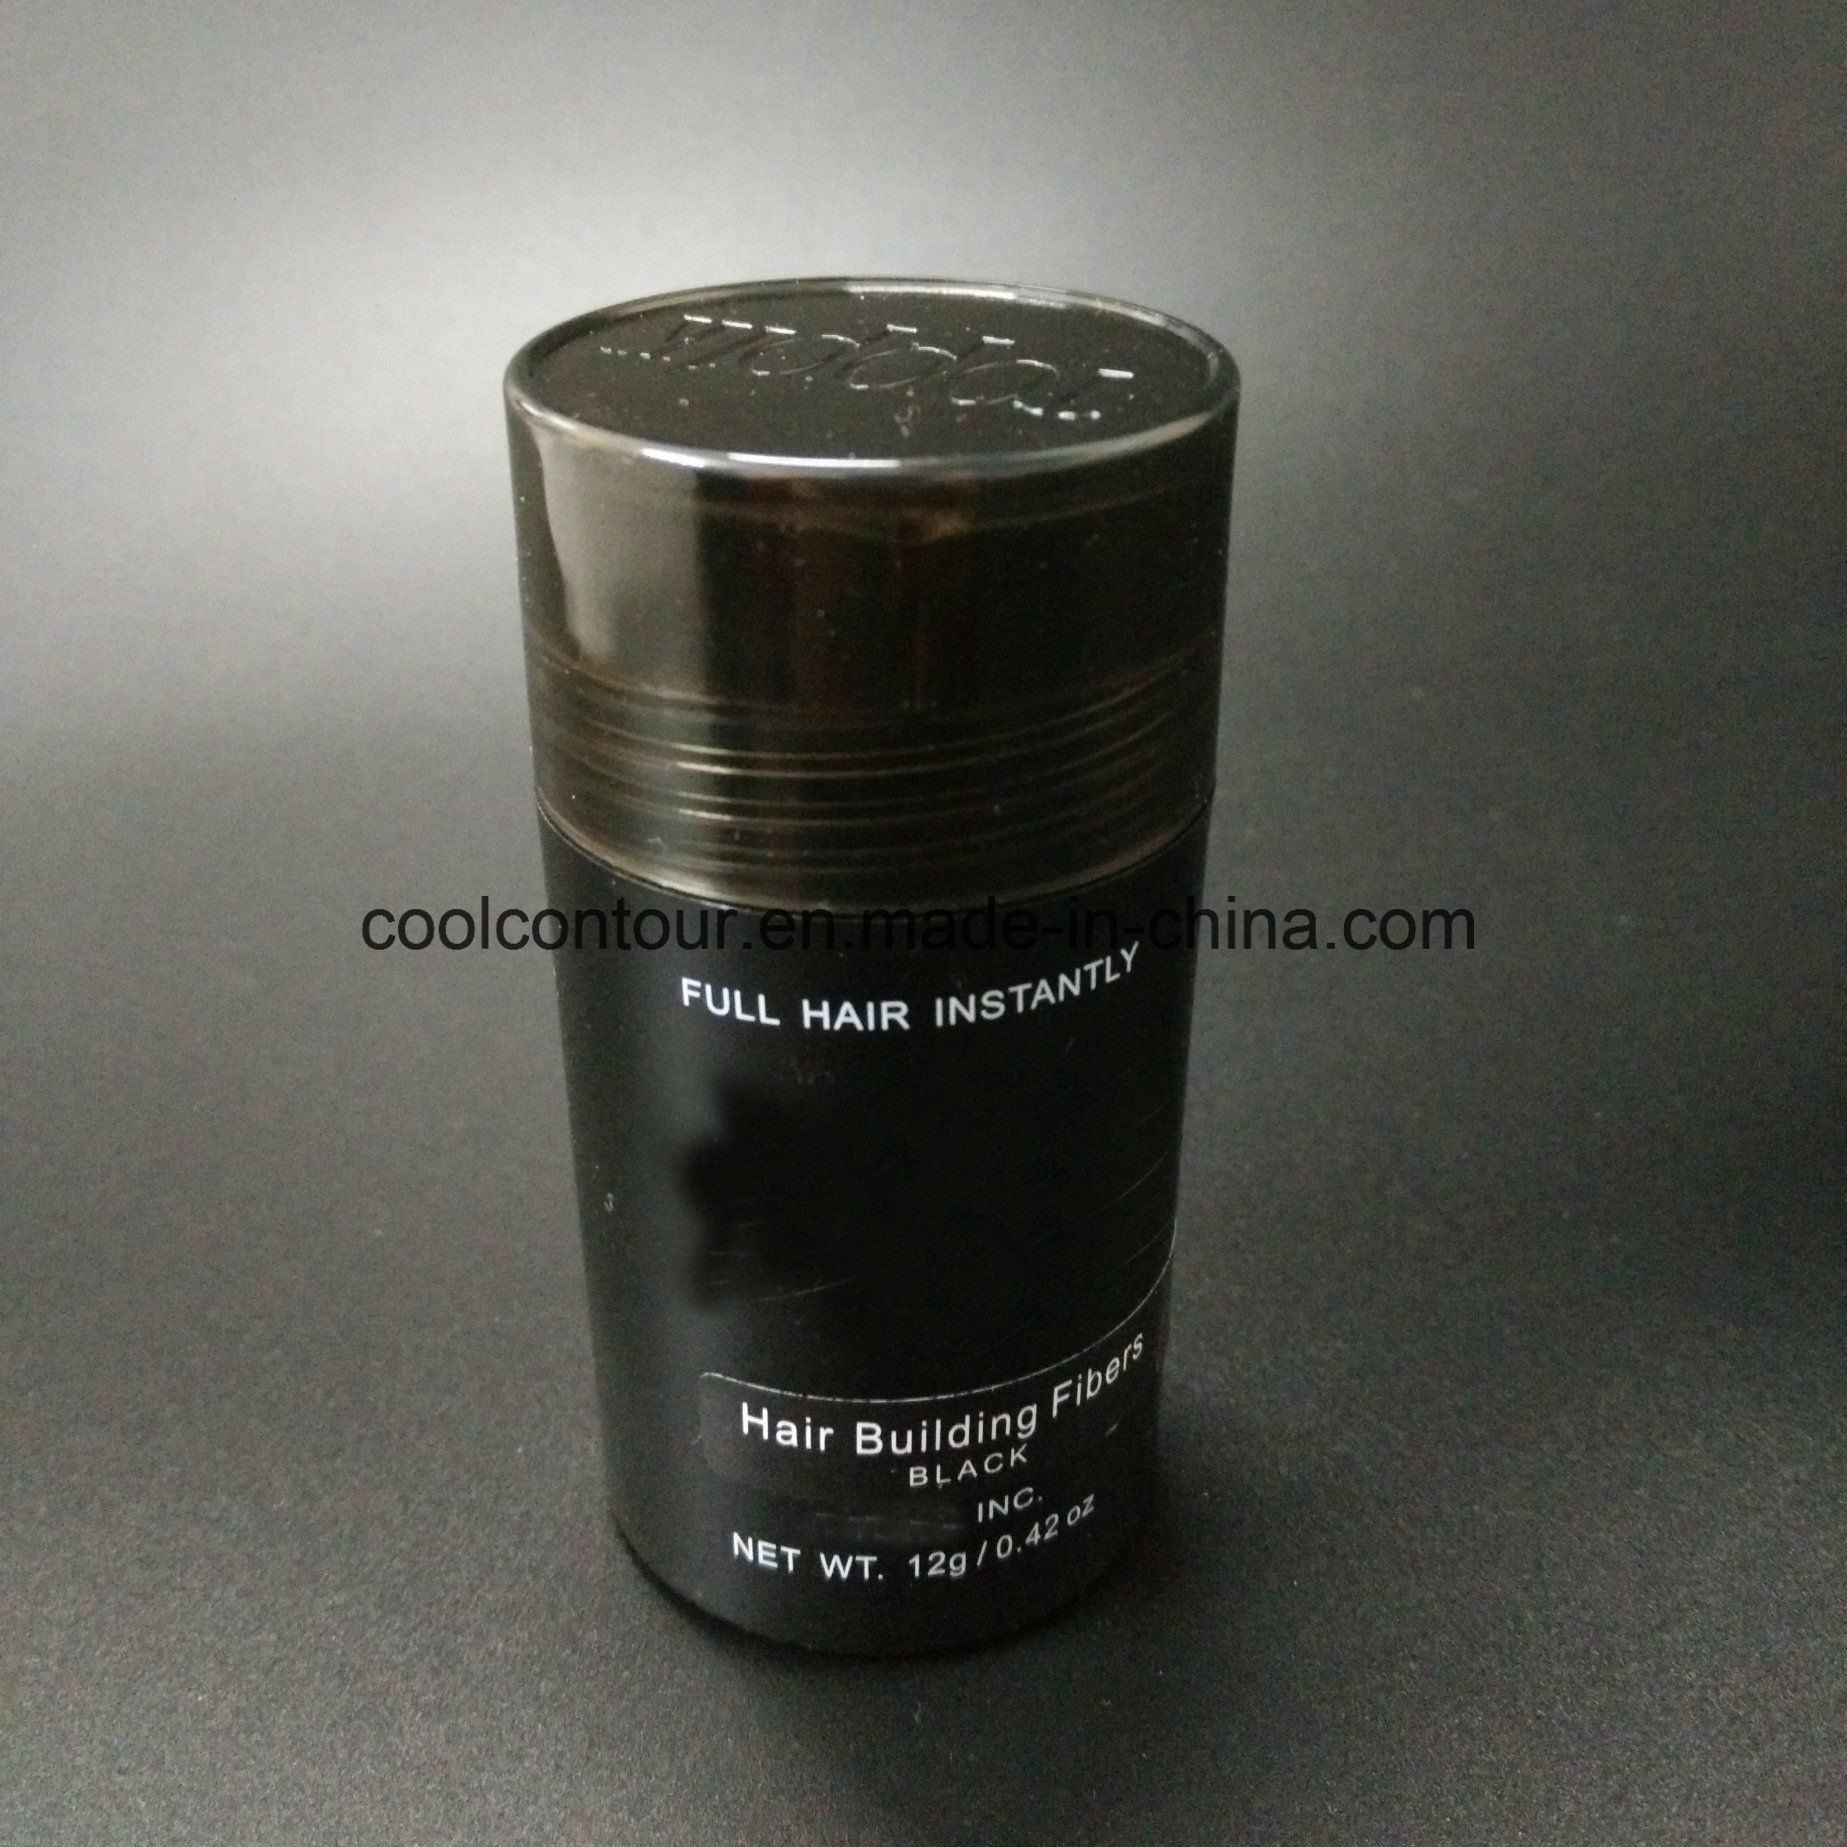 Regrow Hair Instantly Natural Cotton Keratin Hair Fiber Powder